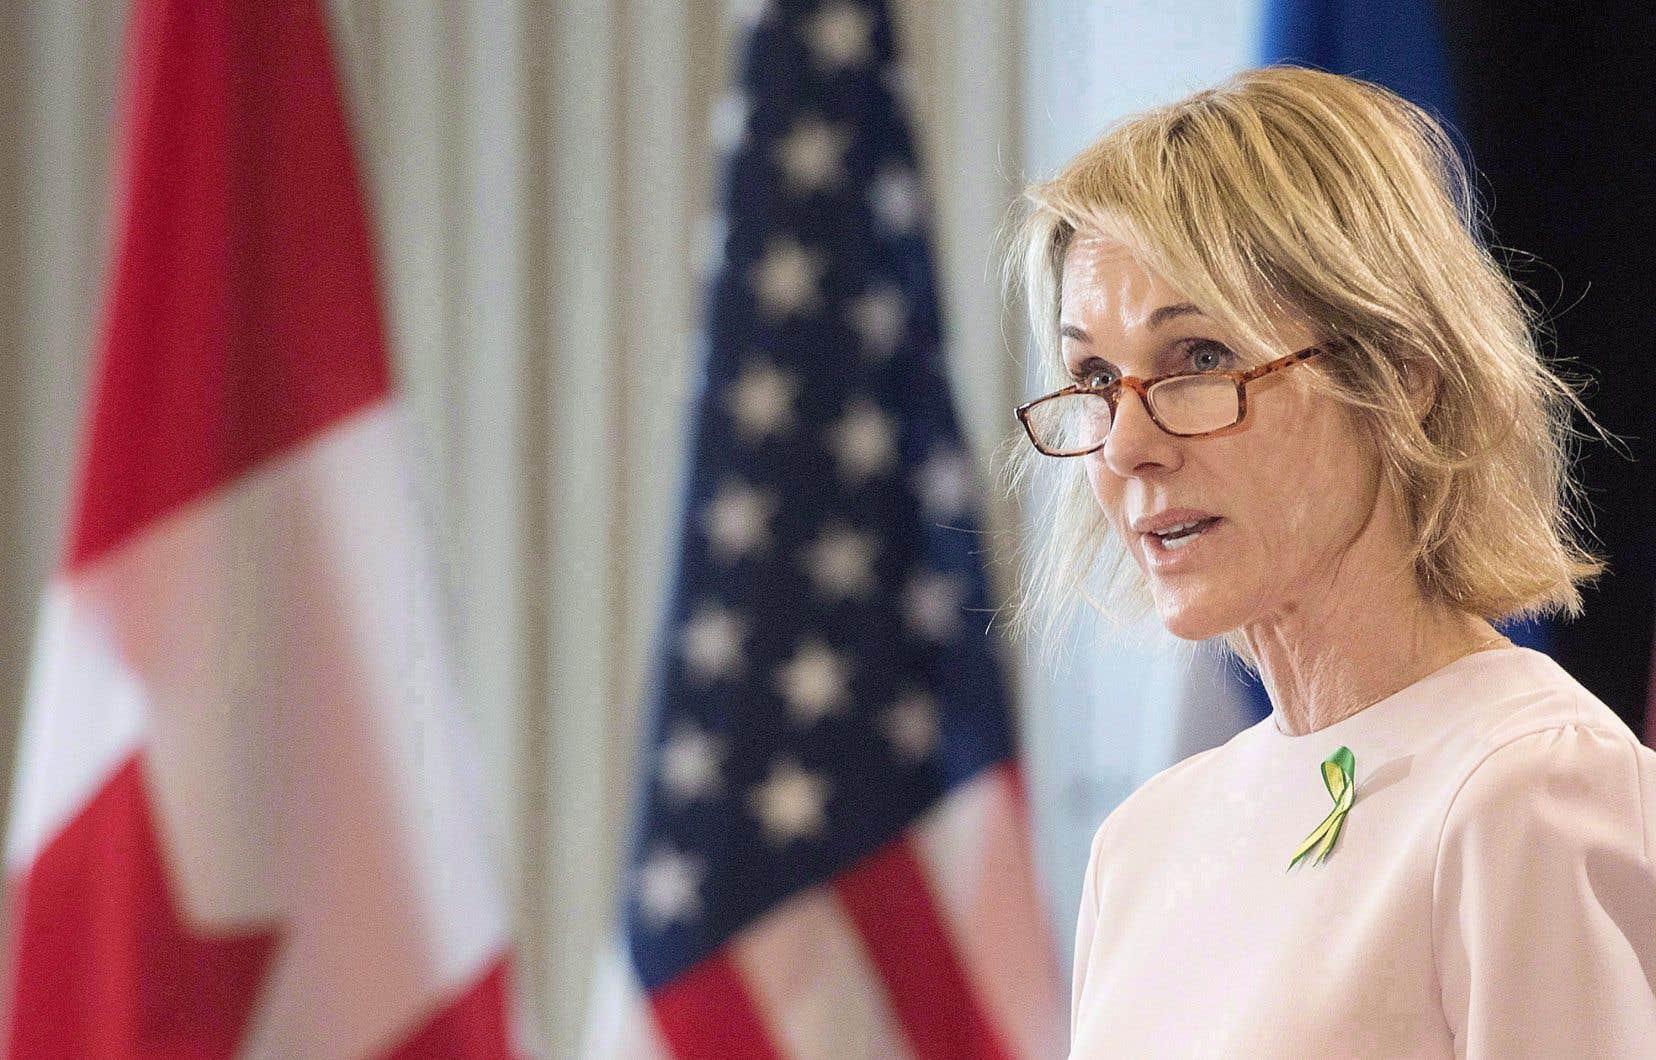 L'ambassadrice américaine au Canada, Kelly Craft